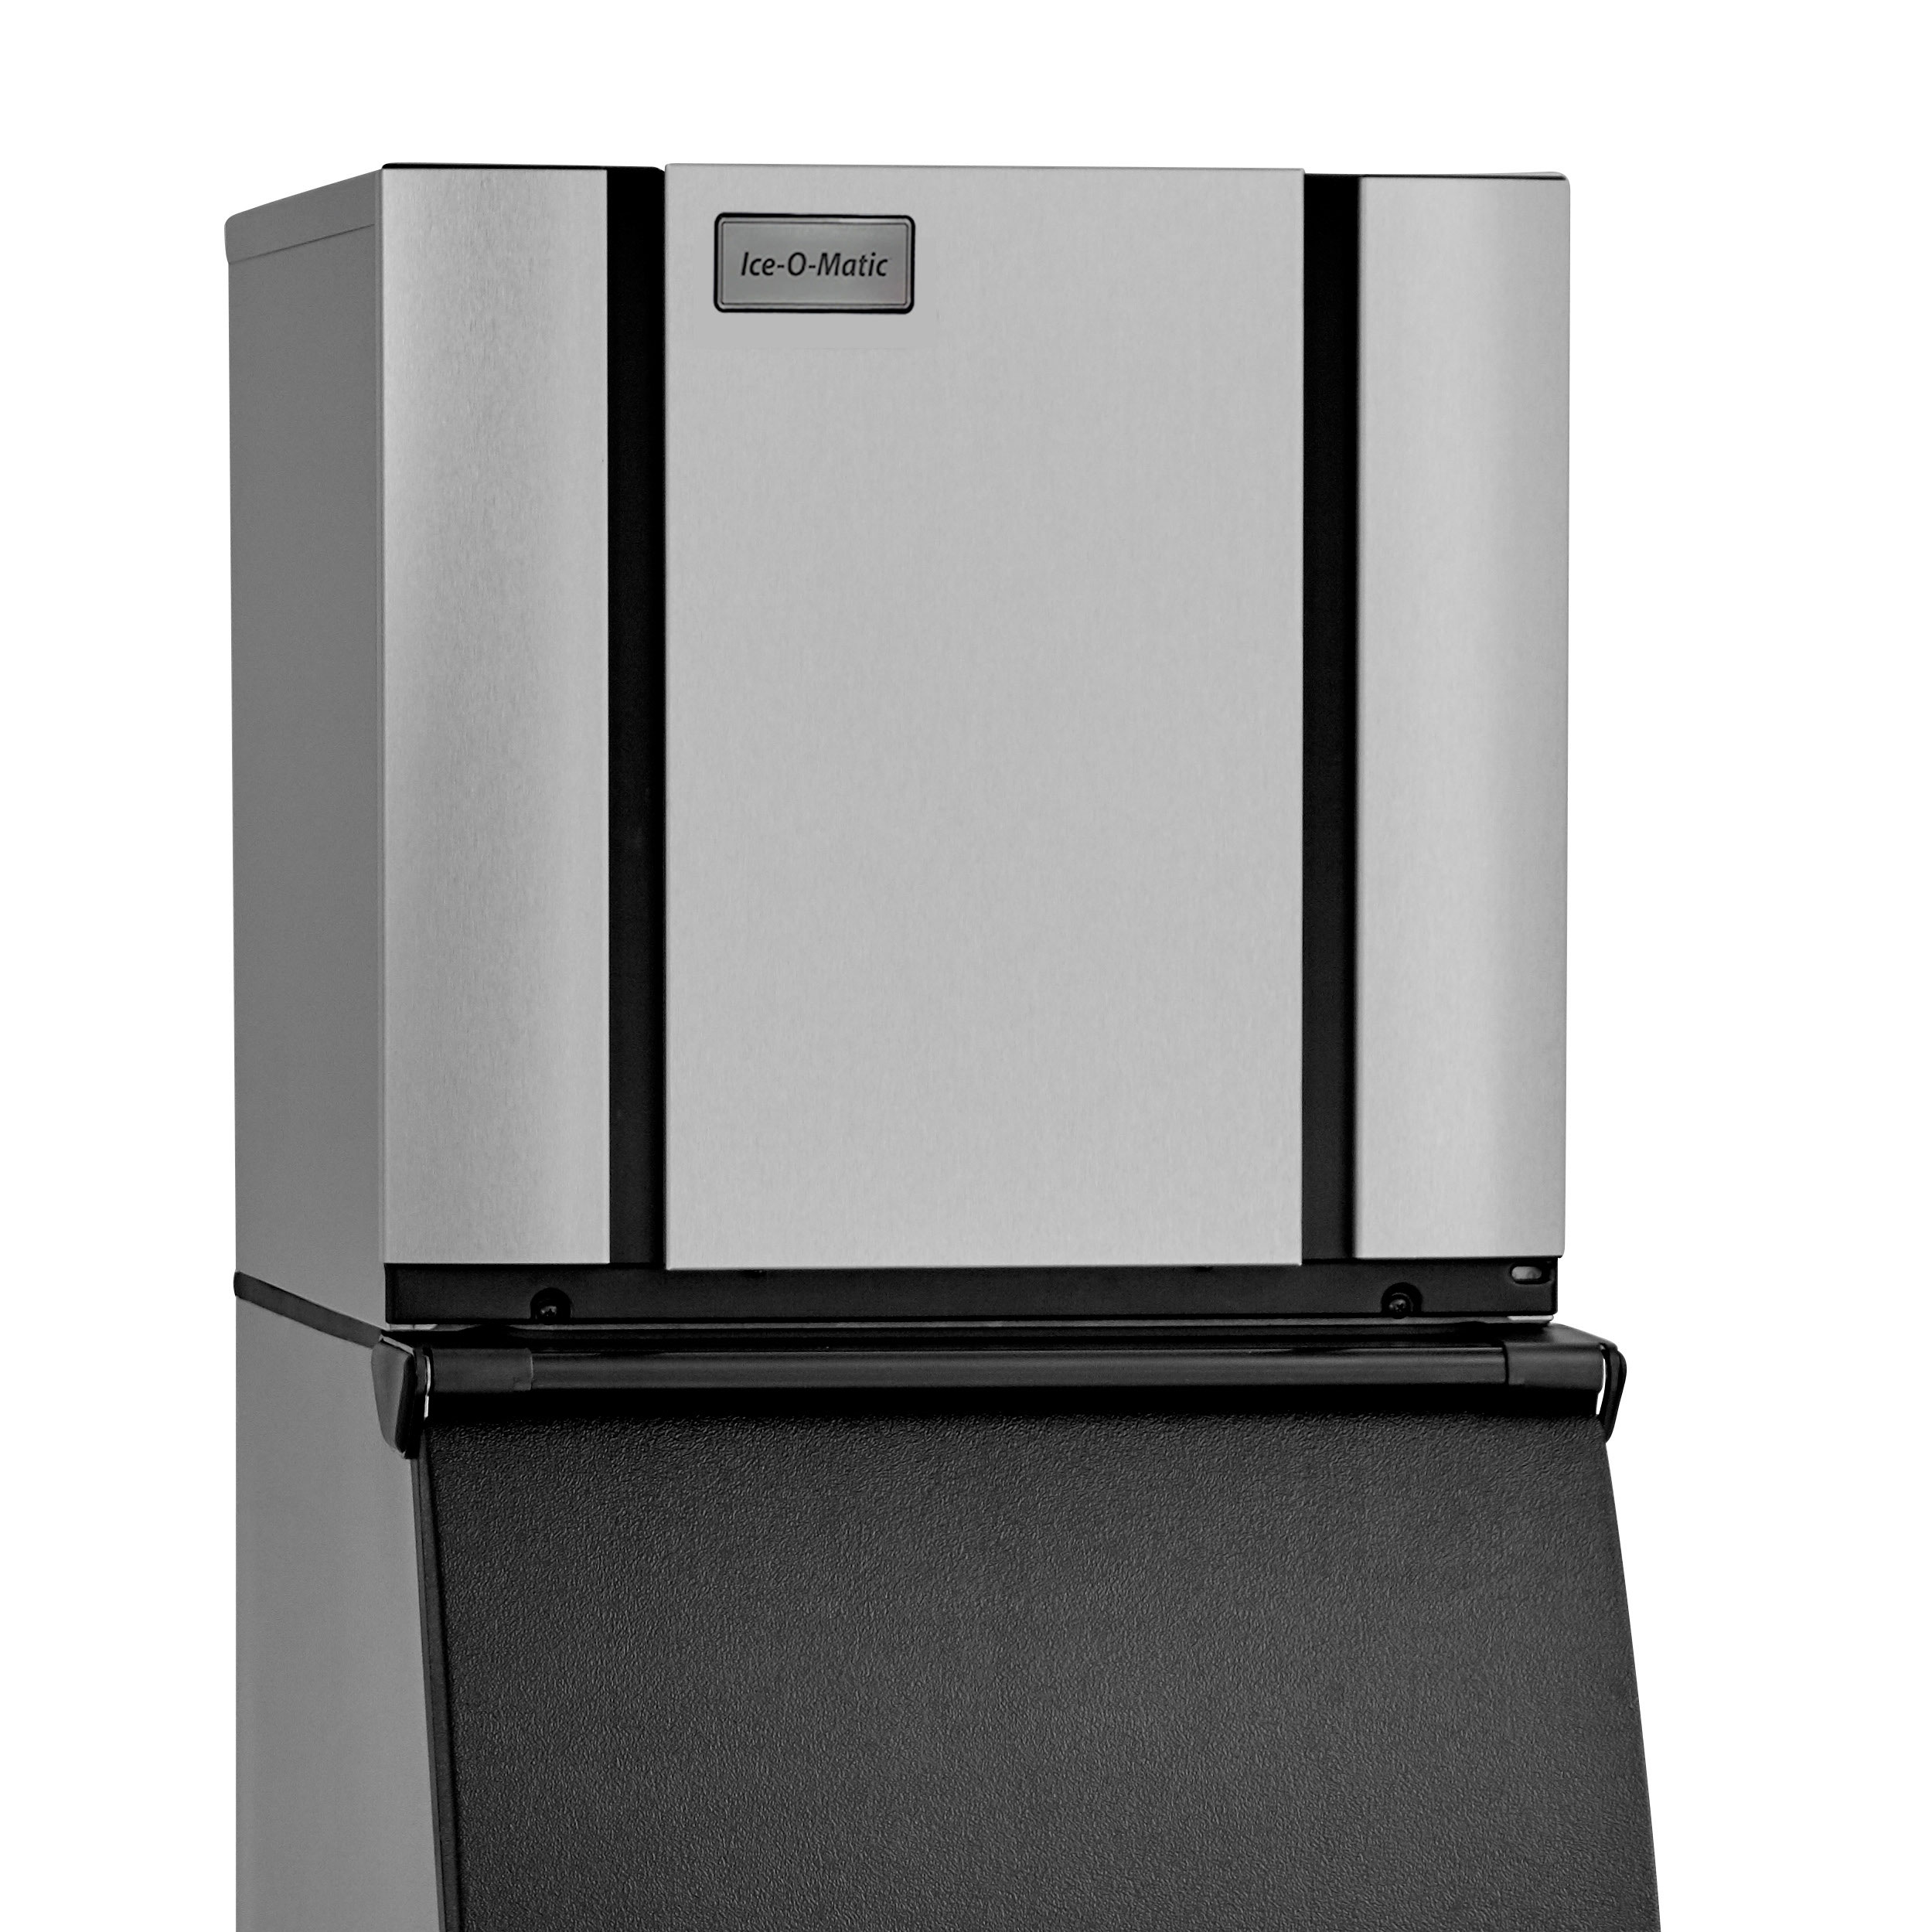 Ice-O-Matic CIM0320HW ice maker, cube-style